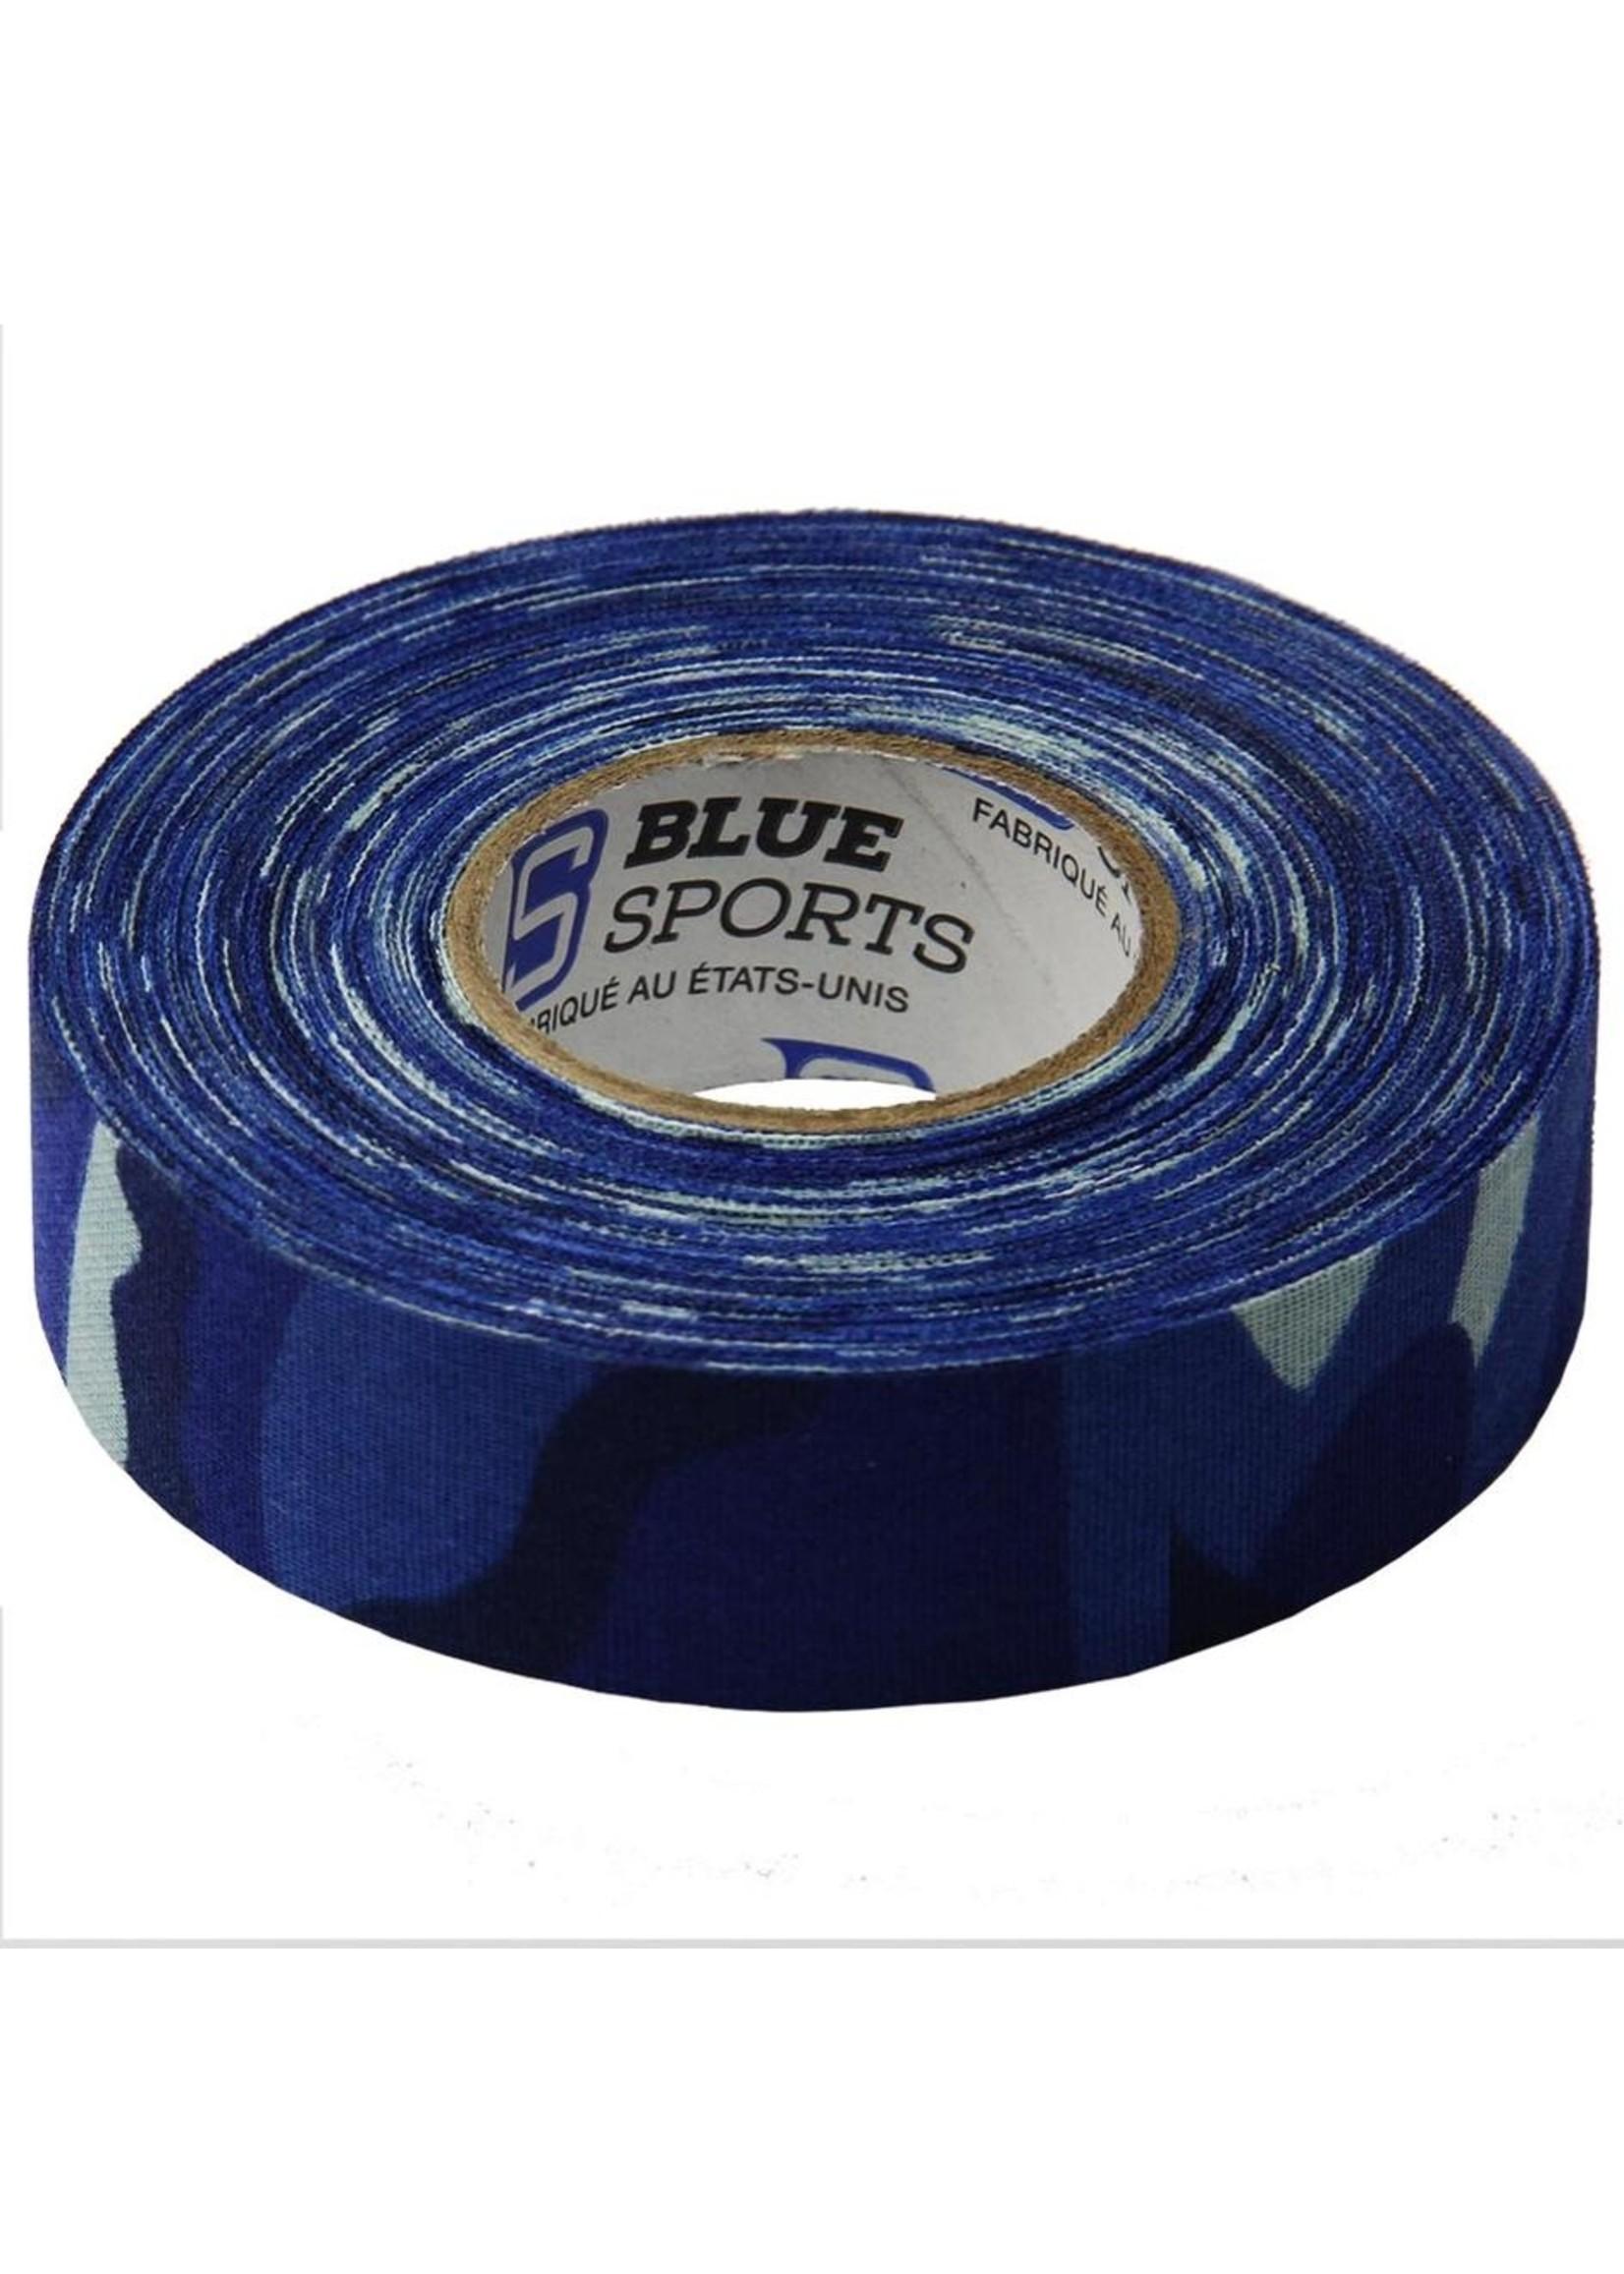 BLUE SPORTS COTTON COULEUR CAMO 24MM X 25M HOCKEY TAPE